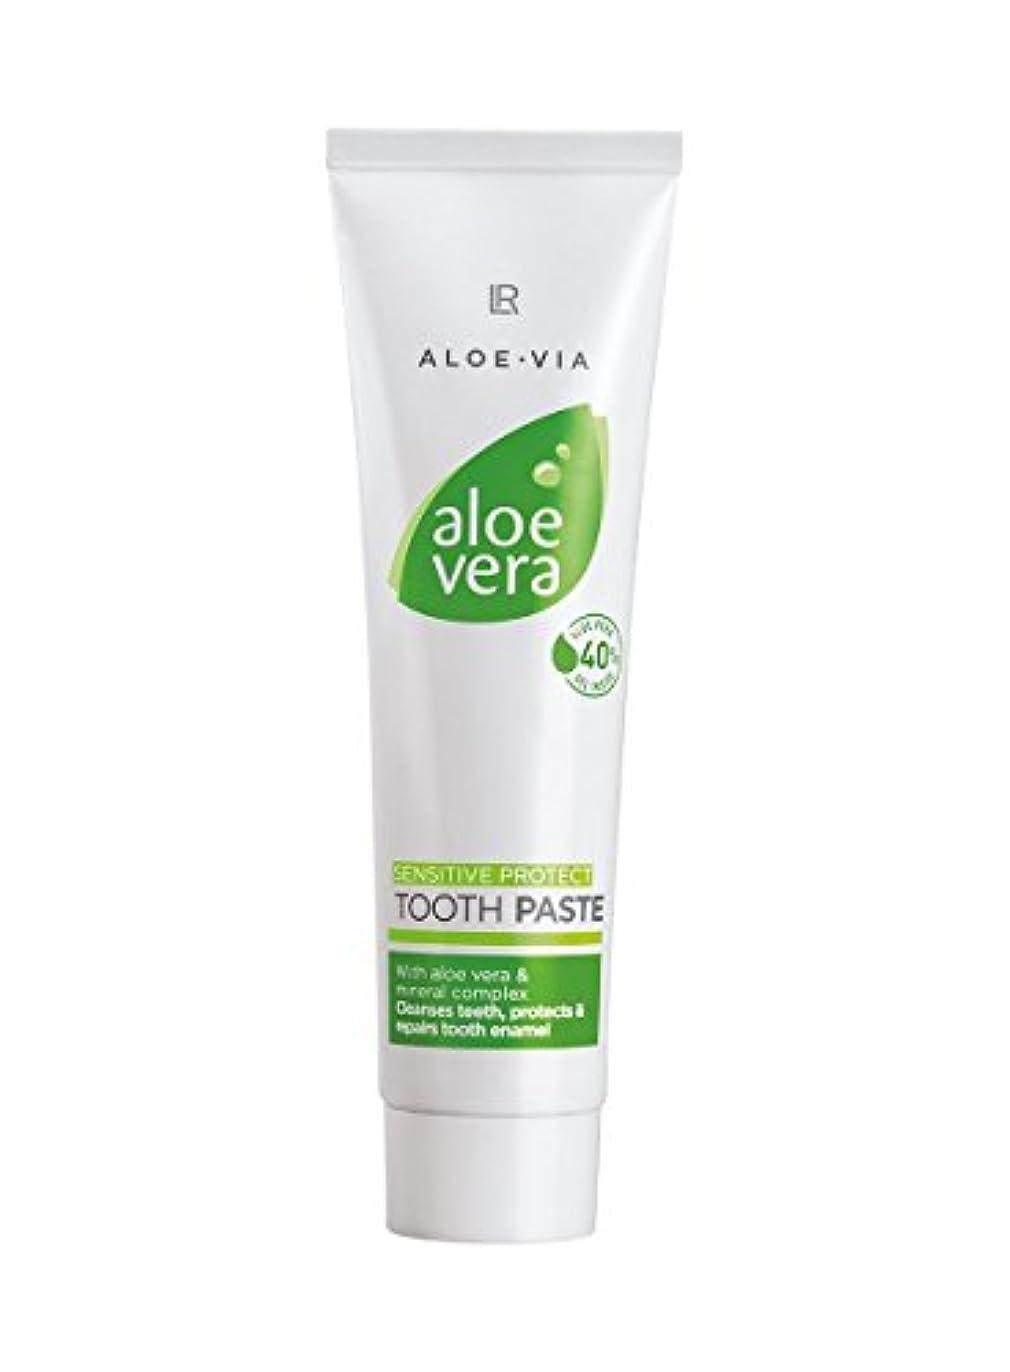 L R アロエベラトゥースジェルセンシティブ歯磨き100mLの活性歯科用洗浄は、歯のエナメル質の保護は、特別に敏感な歯のために処方さ